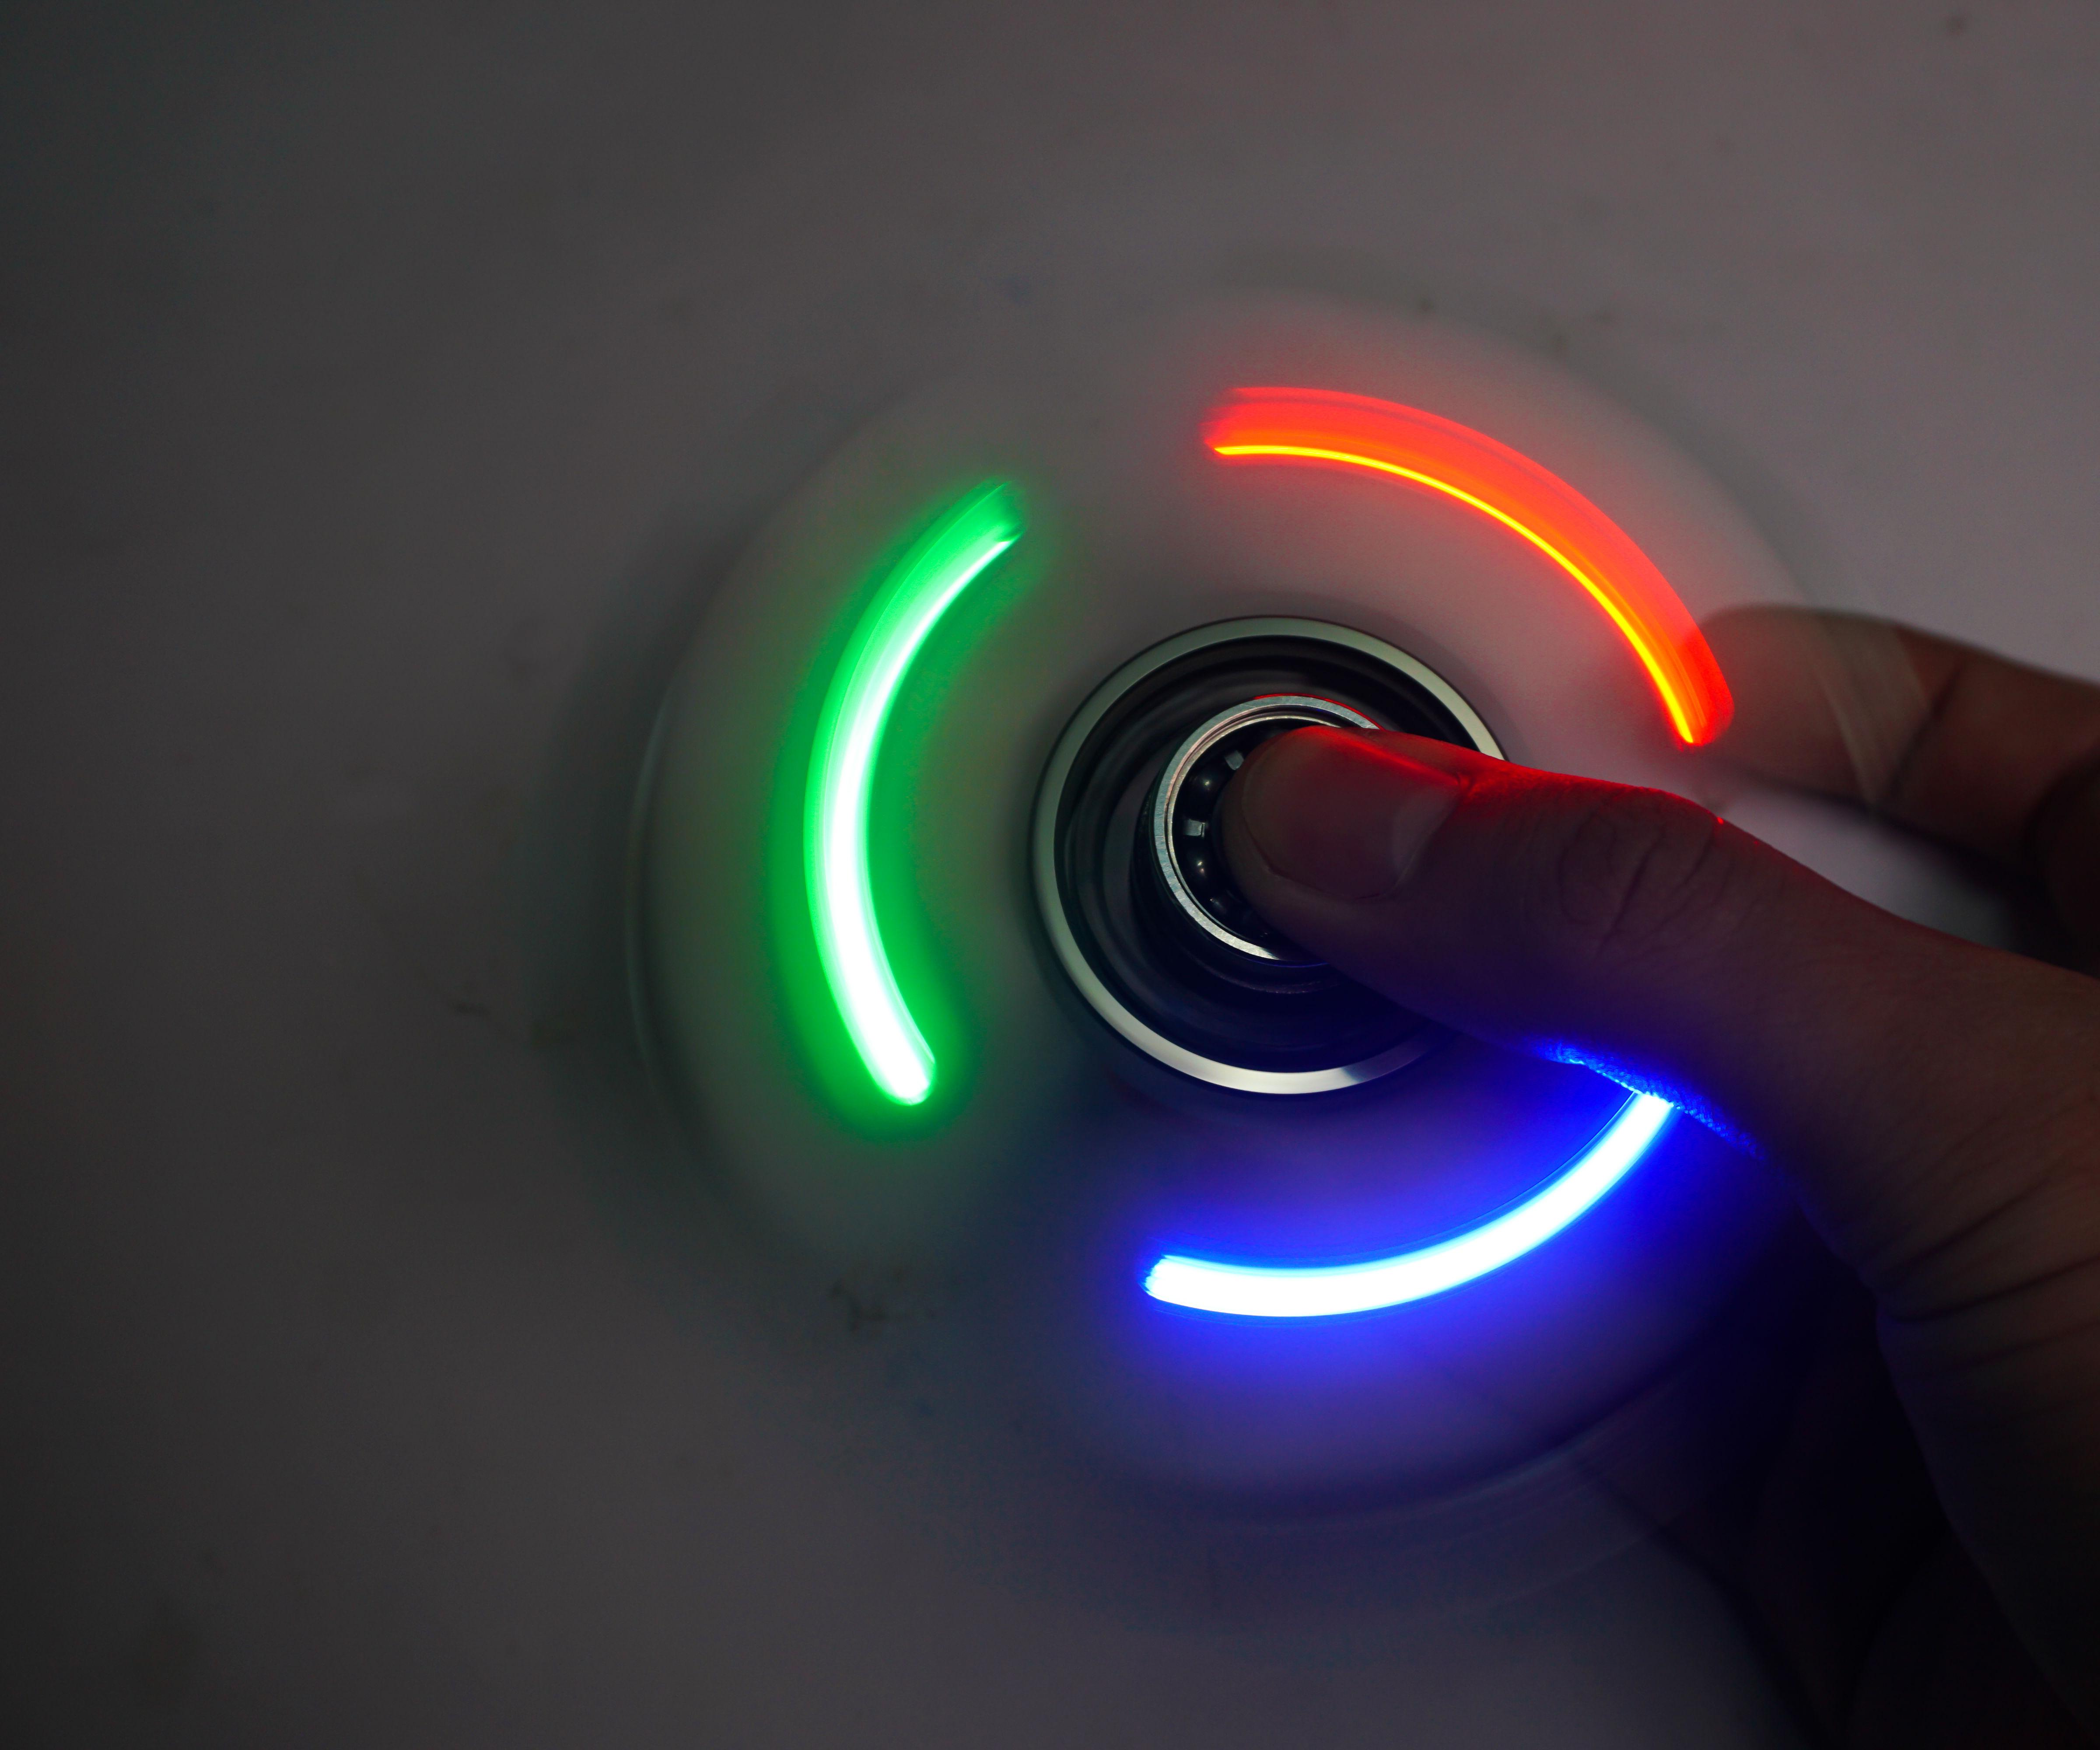 How to Make a LED Fidget Spinner